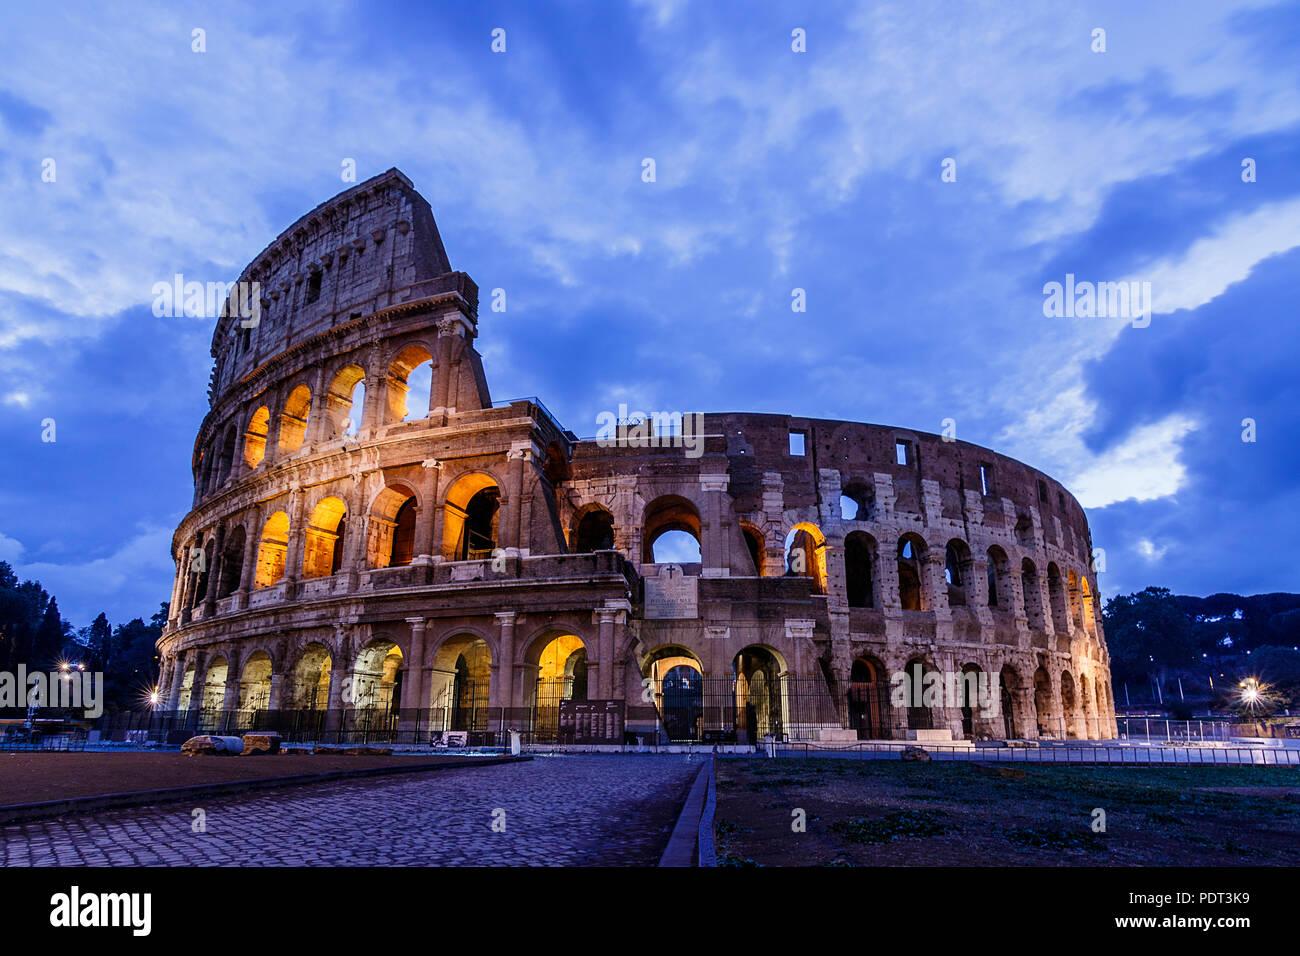 Ein Blick auf die blaue Stunde des Kolosseum, Forum Romanum, UNESCO-Weltkulturerbe, Rom, Italien. Stockbild